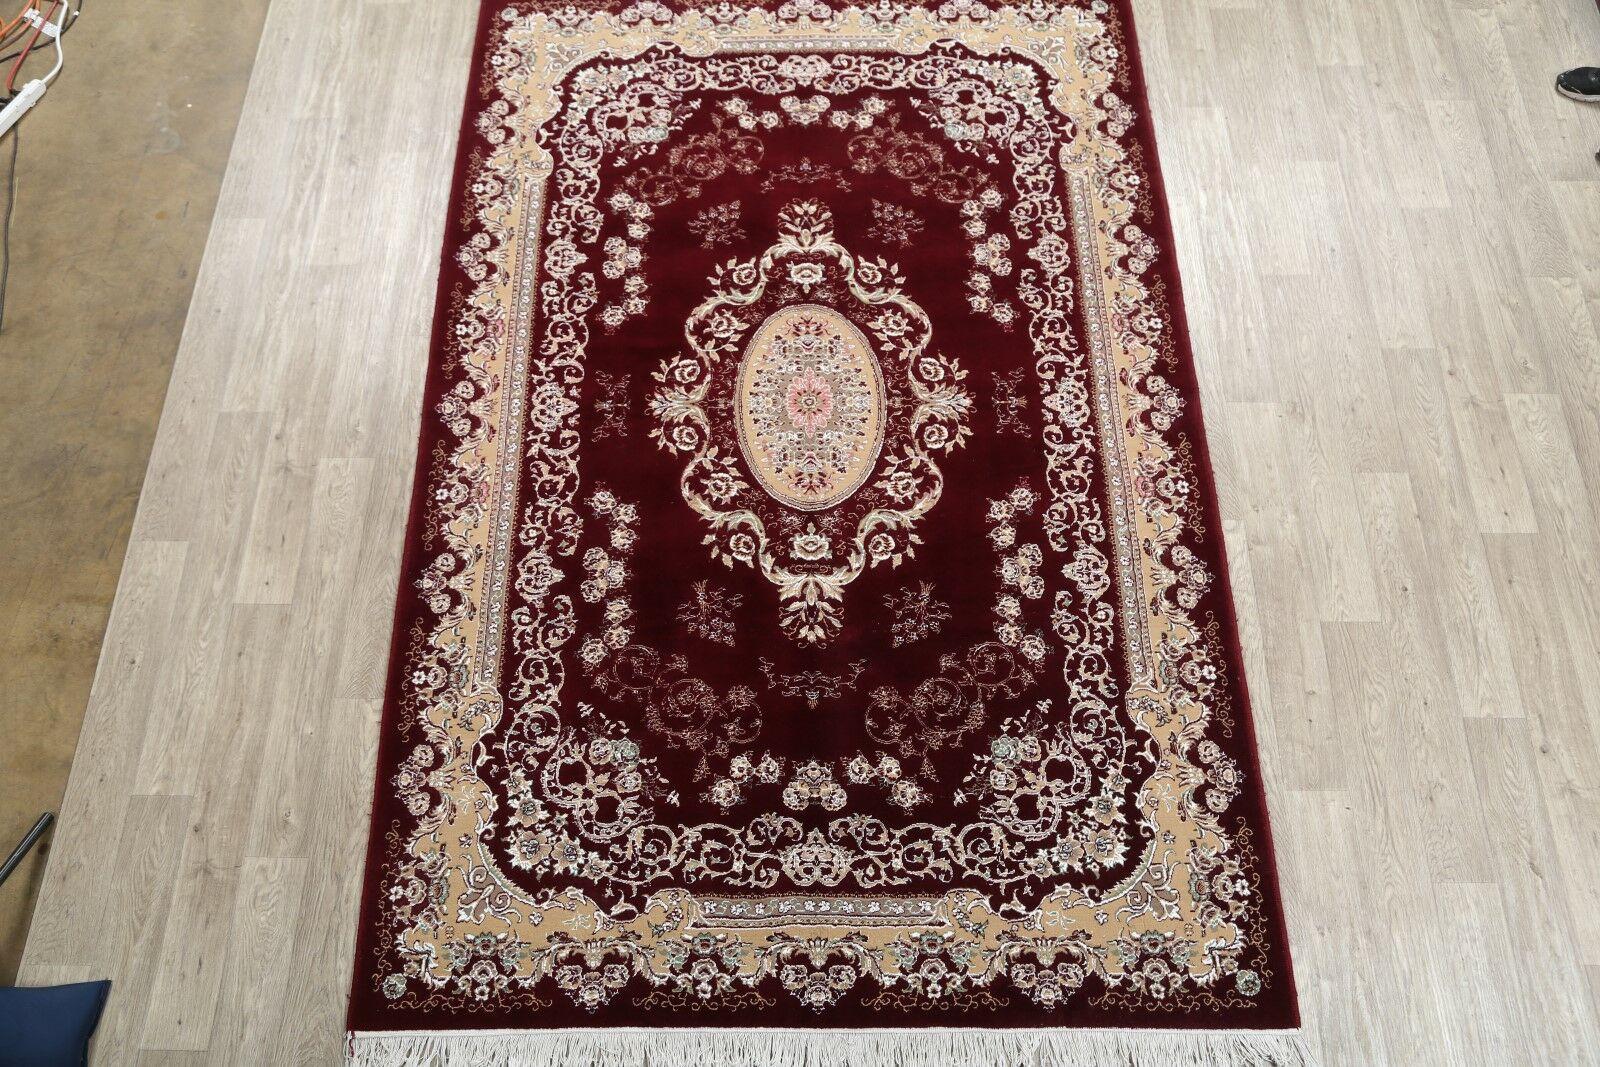 Classical Soft Plush Floral Tabriz Persian Burgundy/Beige Area Rug